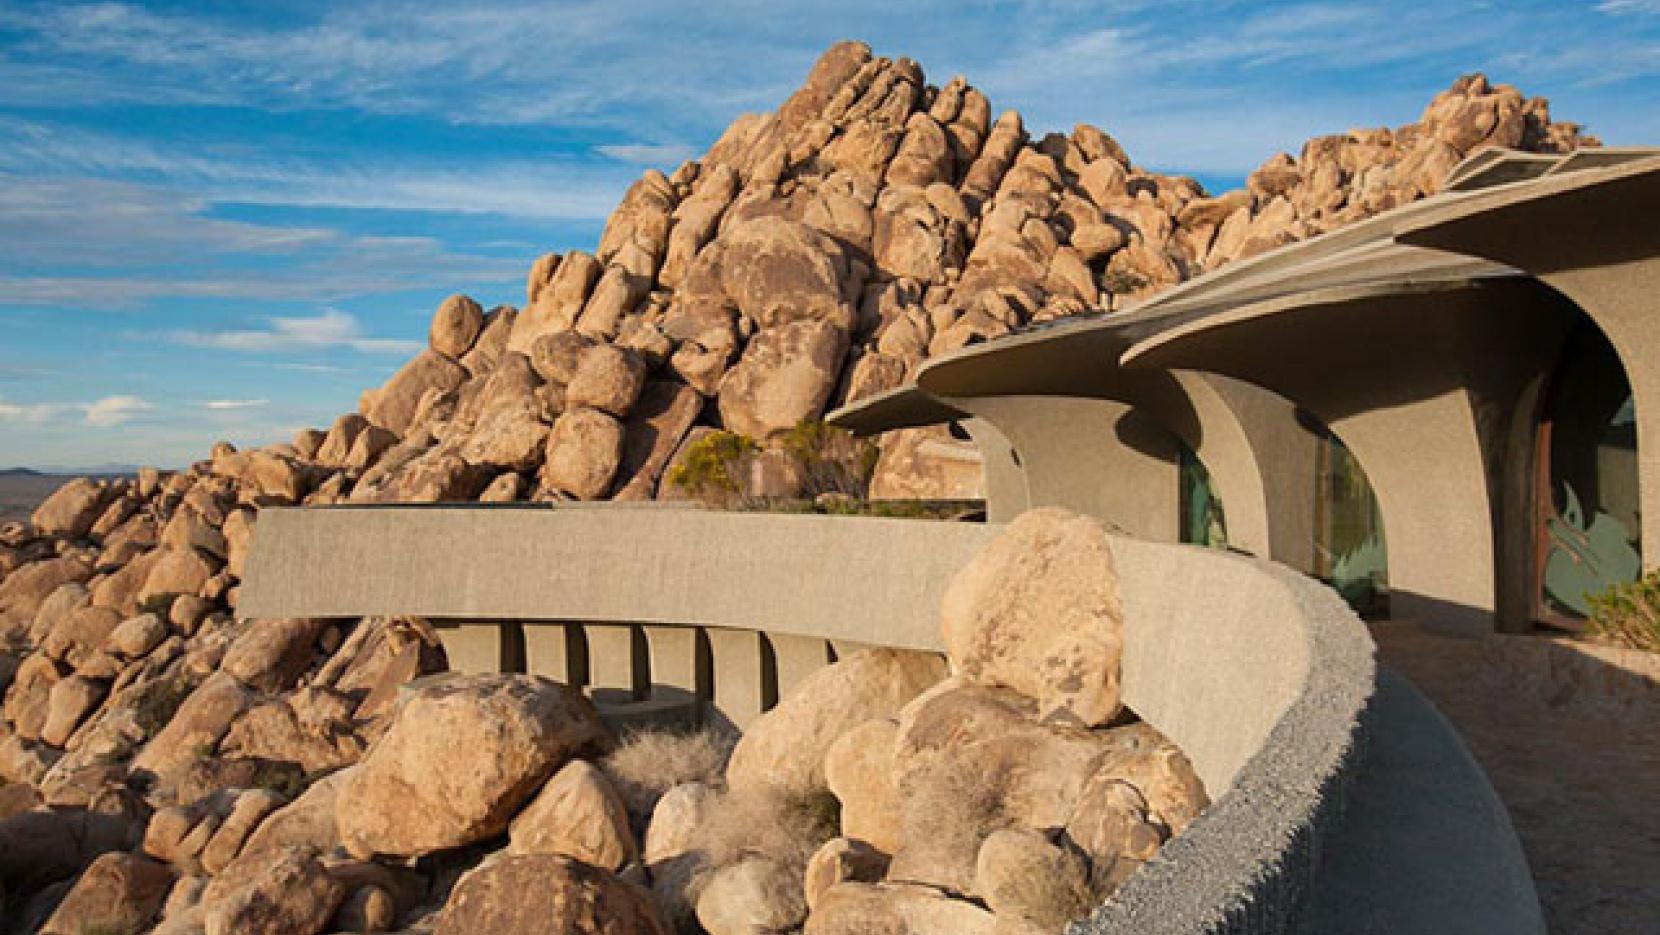 The desert house a landmark of american organic architecture by kendrick bangs kellogg yatzer